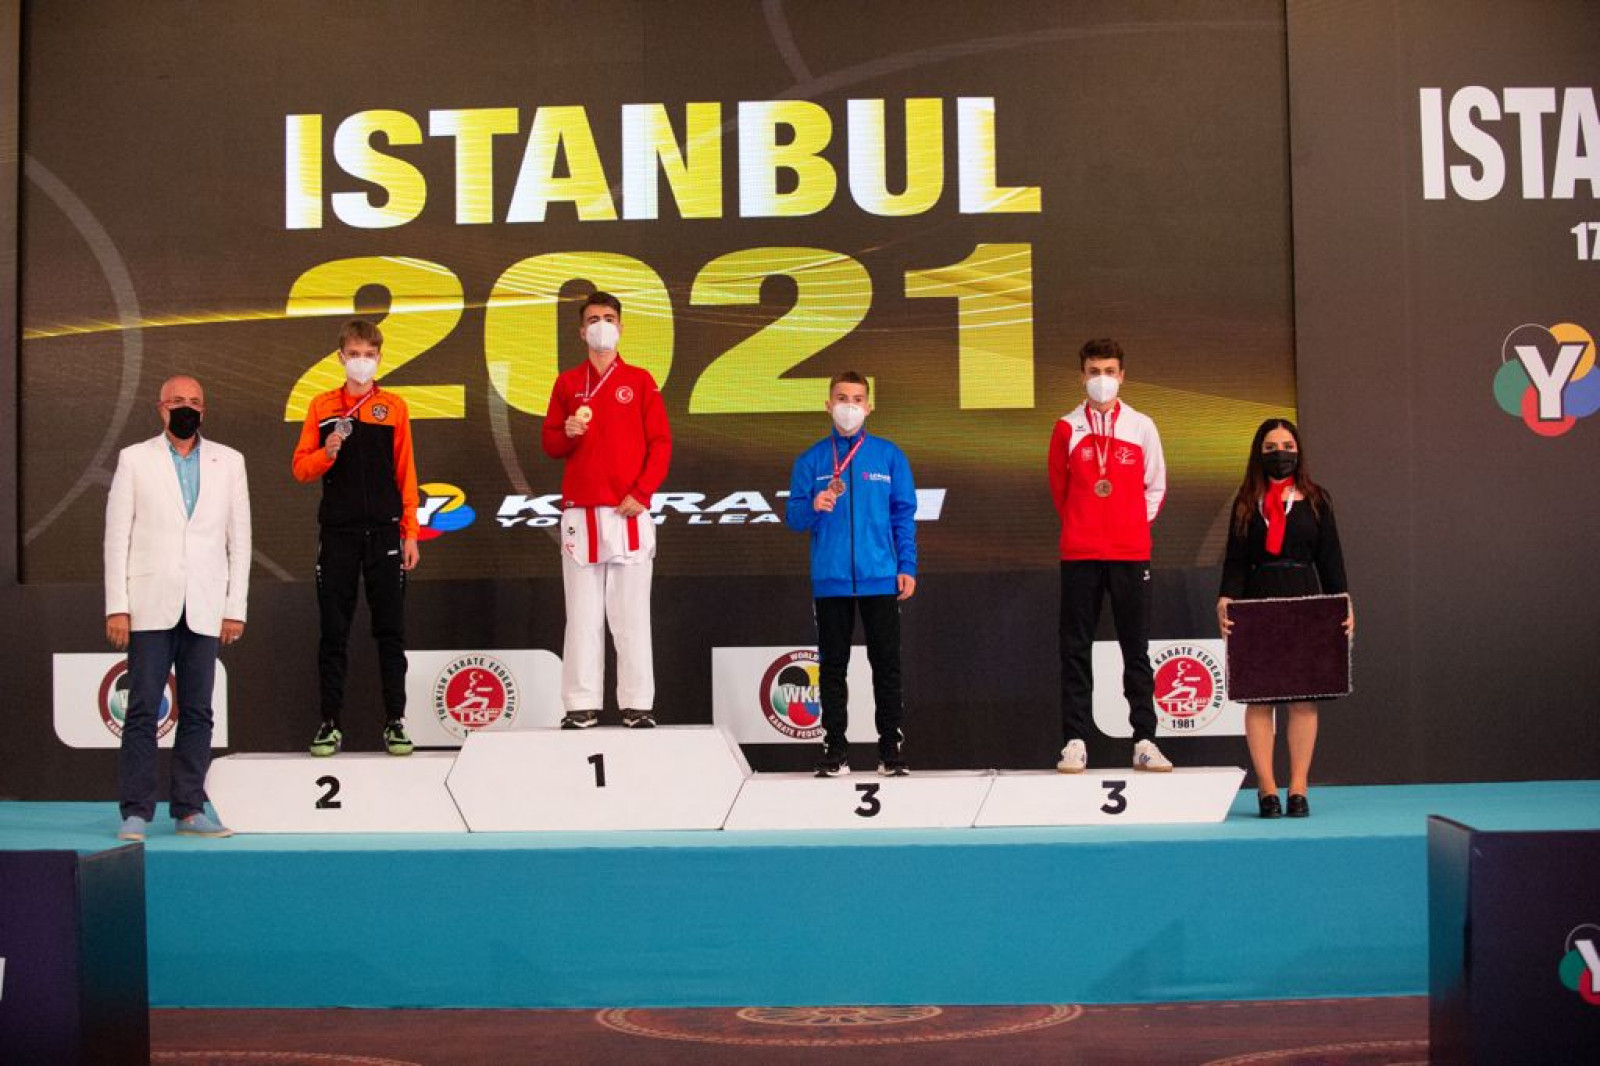 Théo Karlen, YL Istanbul 2021